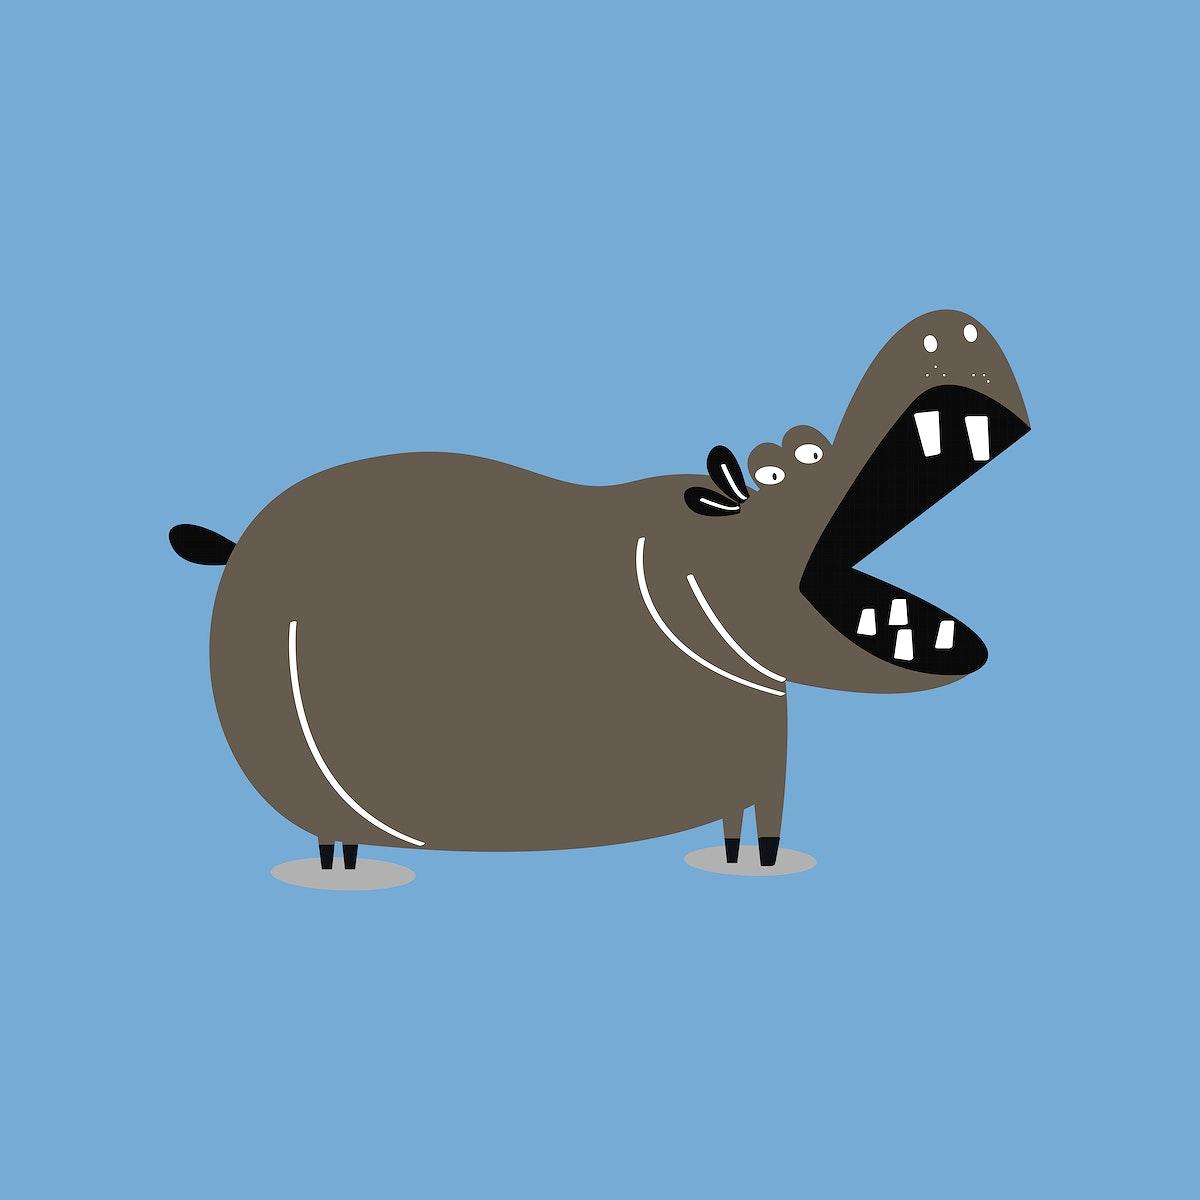 Cute hippopotamus animal psd doodle sticker in black for kids